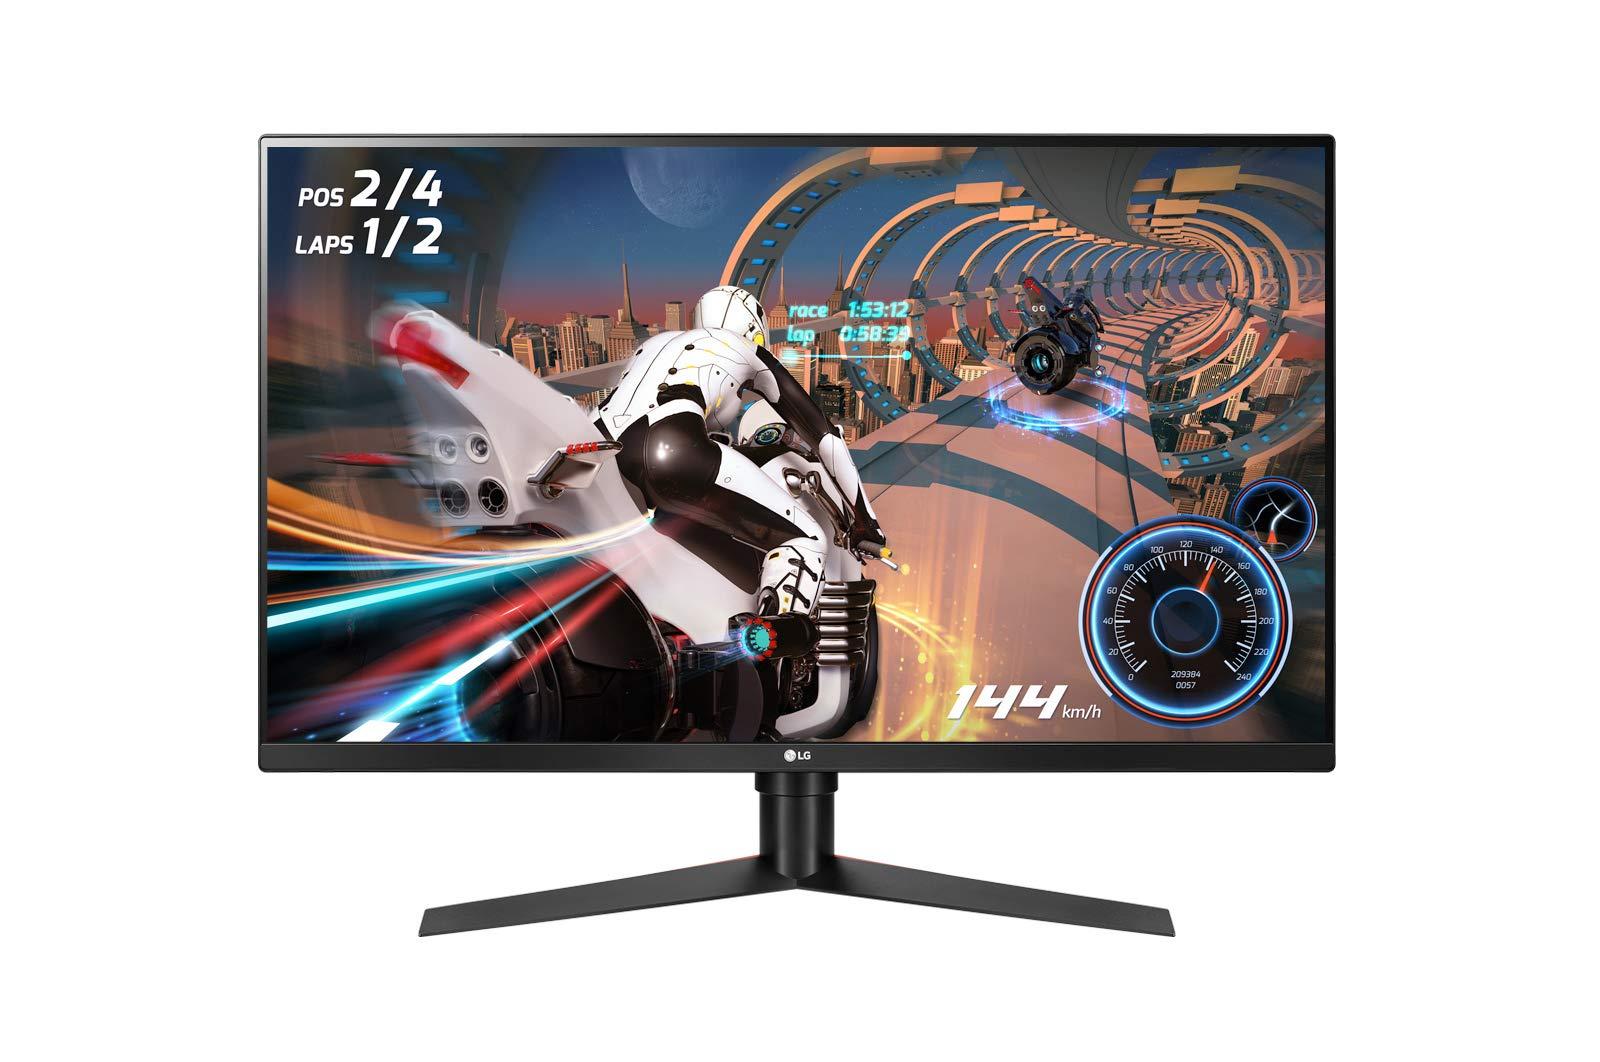 LG 32GK850F pantalla para PC - Monitor: Amazon.es: Informática